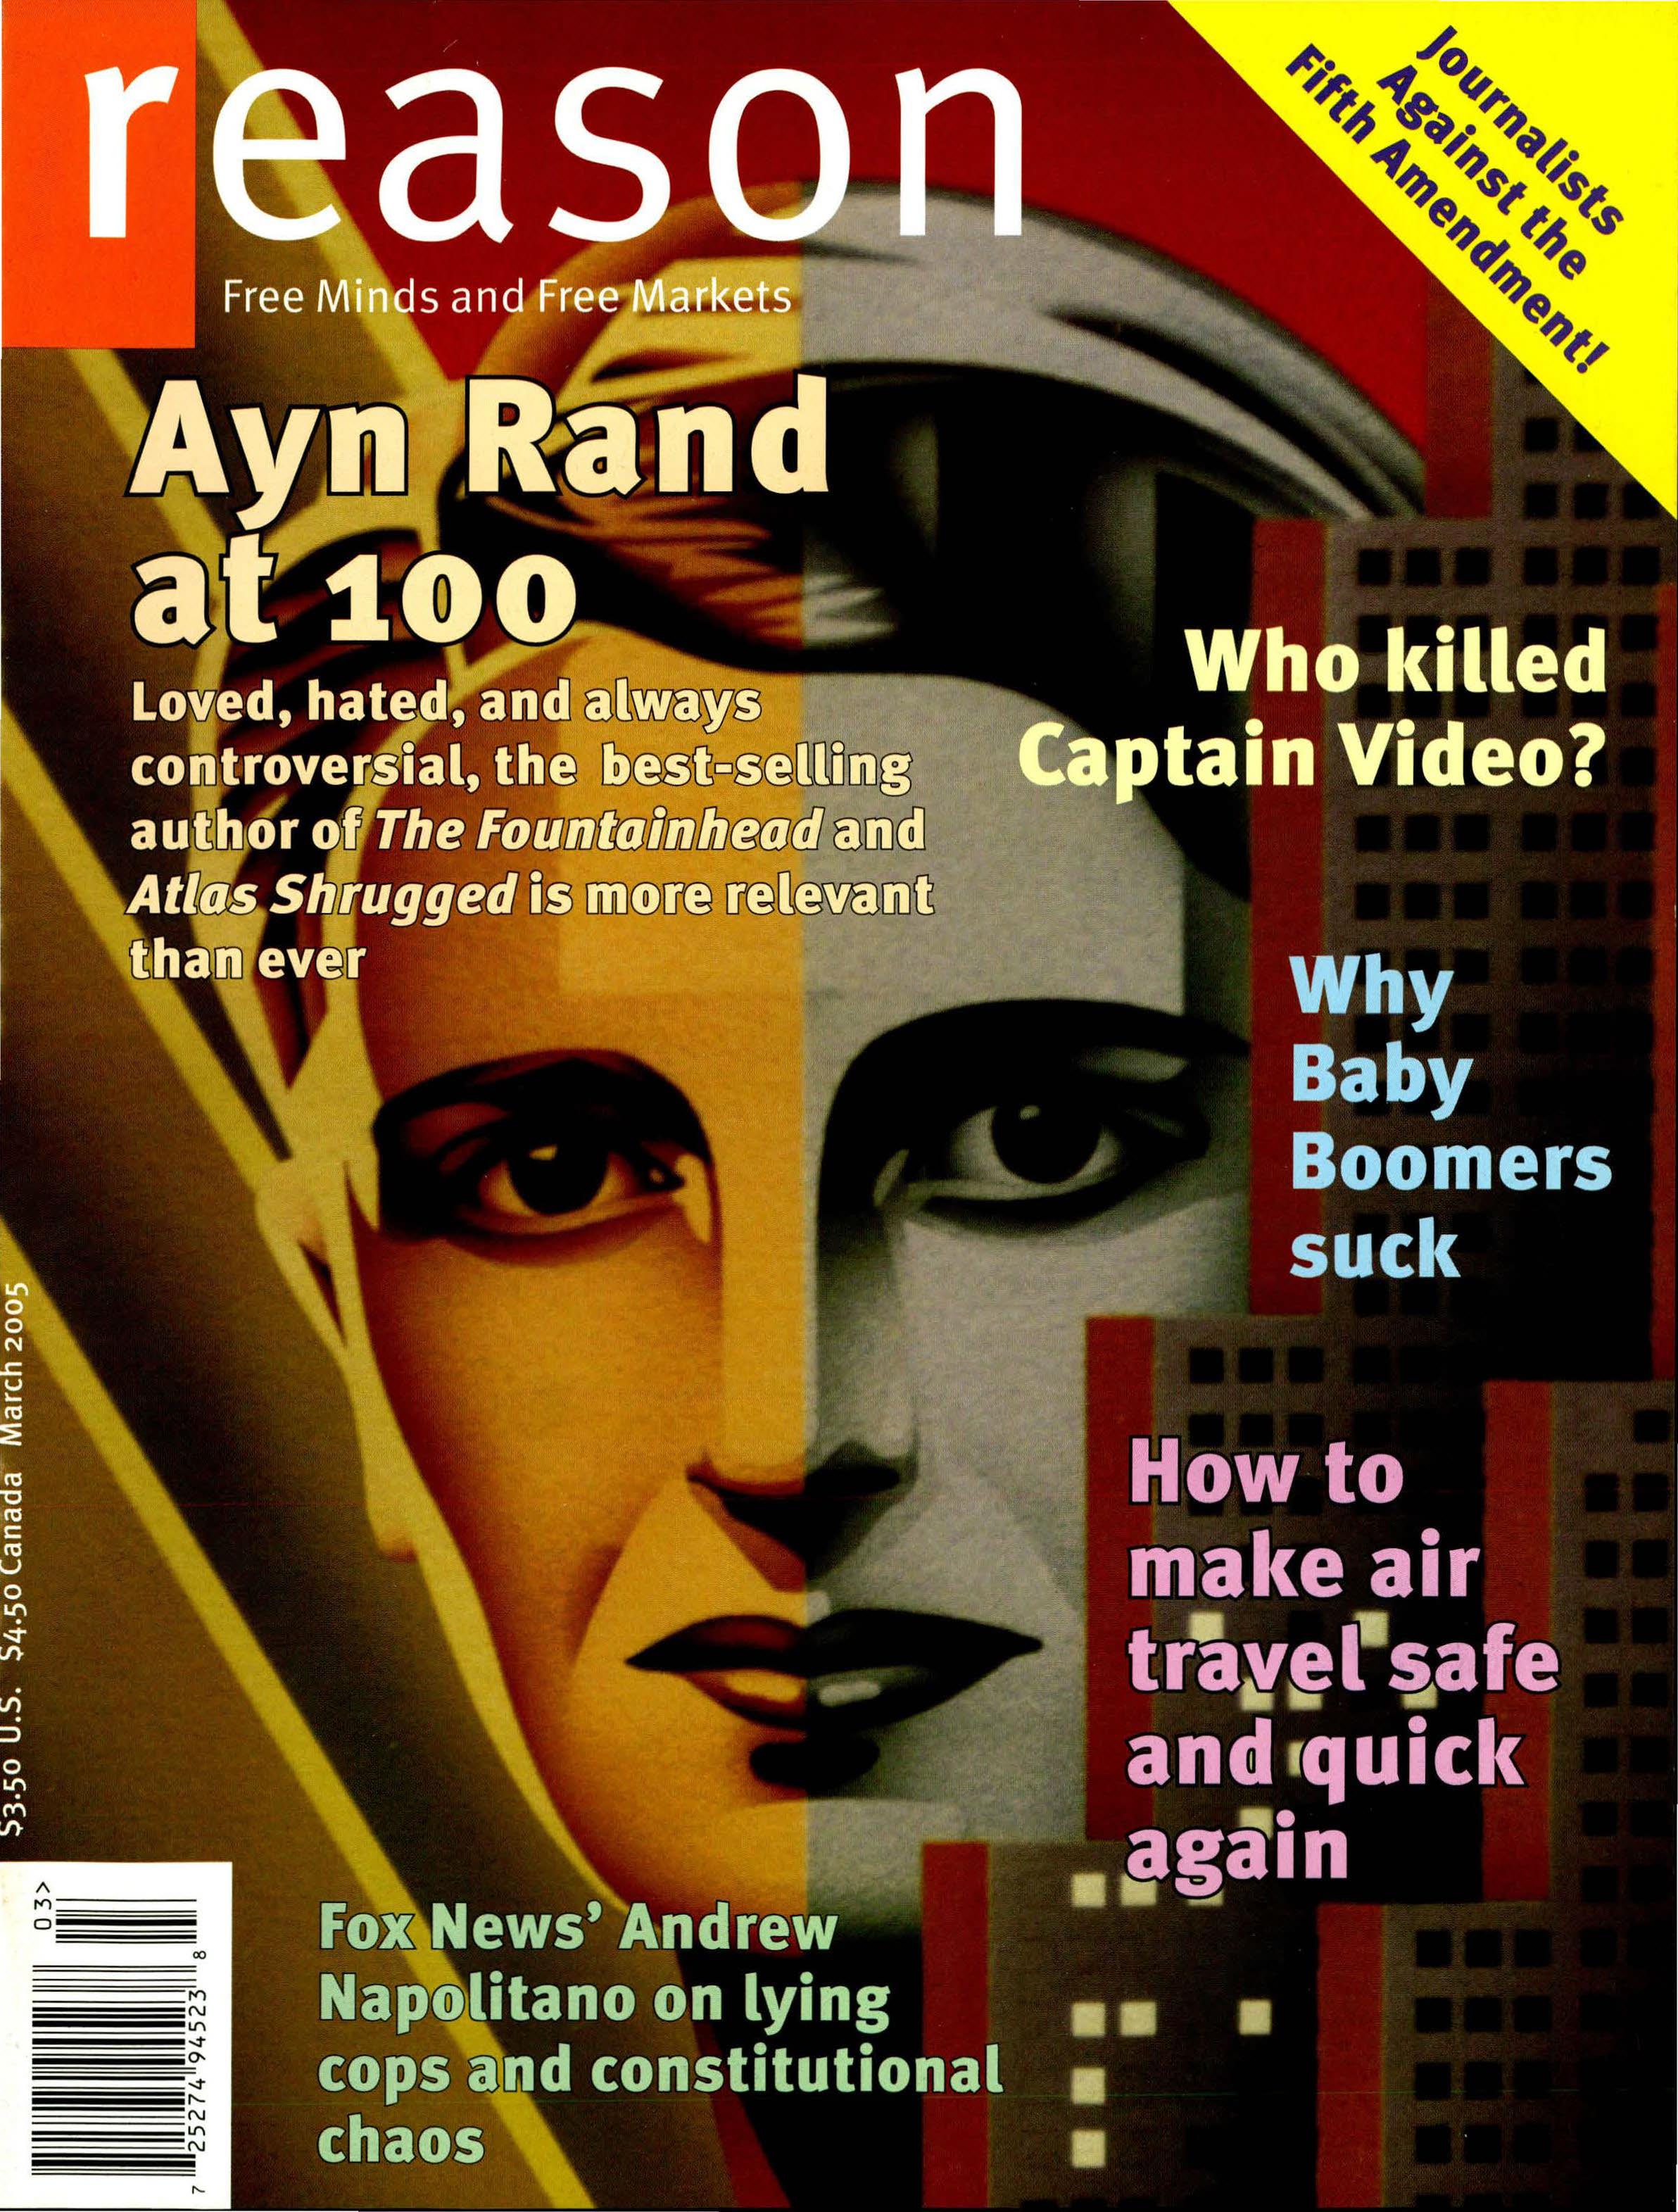 Reason Magazine, March 2005 cover image